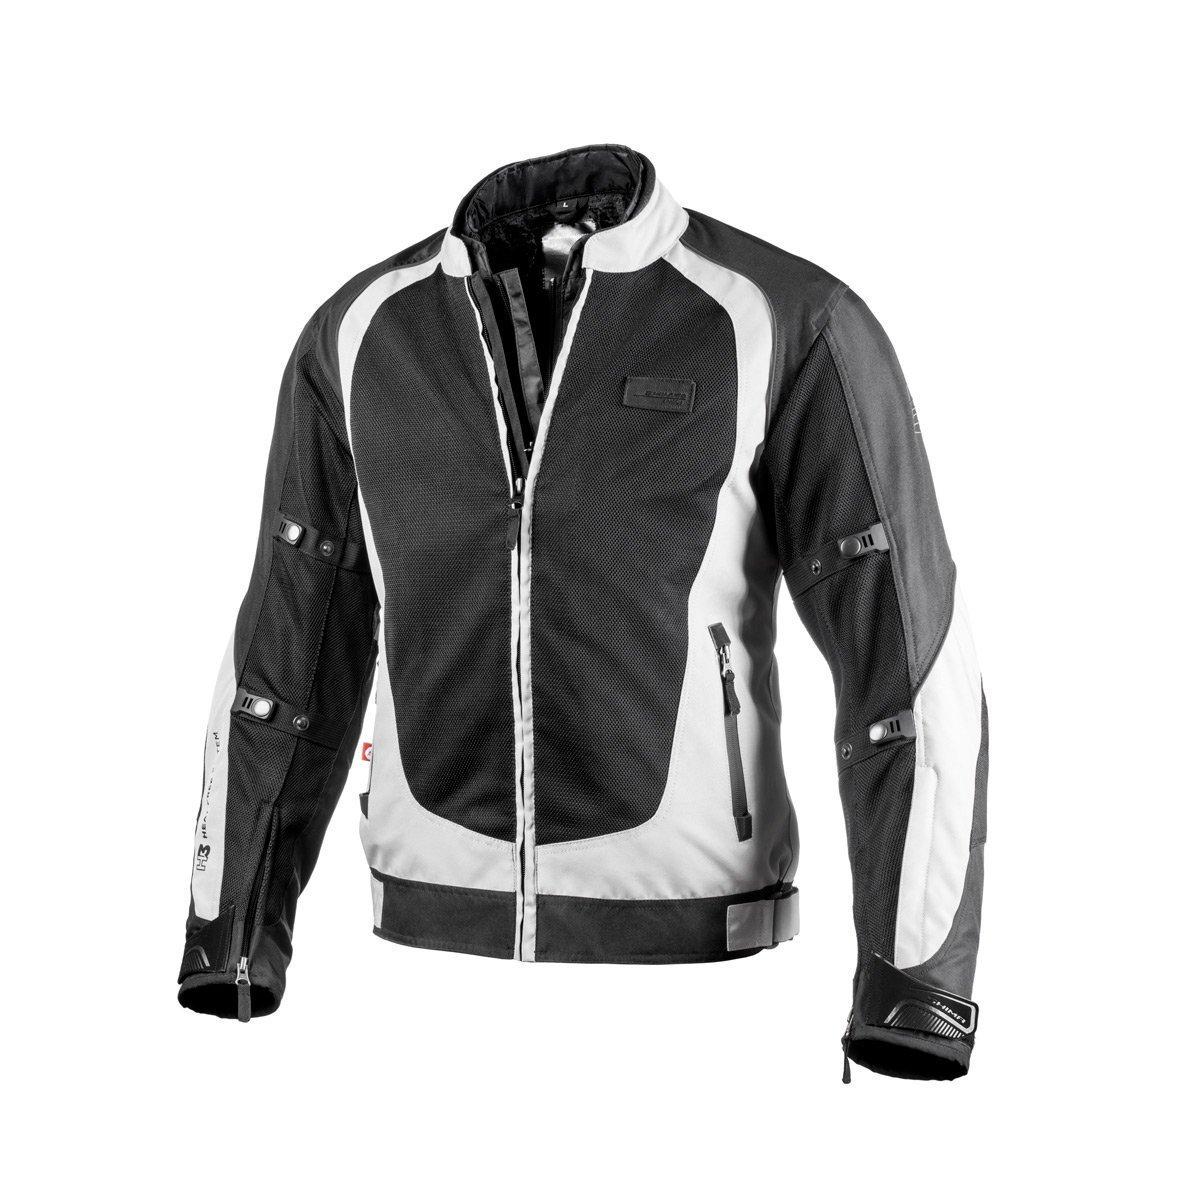 Shima X-MESH GREY, Sport Protective Summer Comfort Stylish Reflective Motorbike Jacket (S-XXL), Grey, Size:XXL